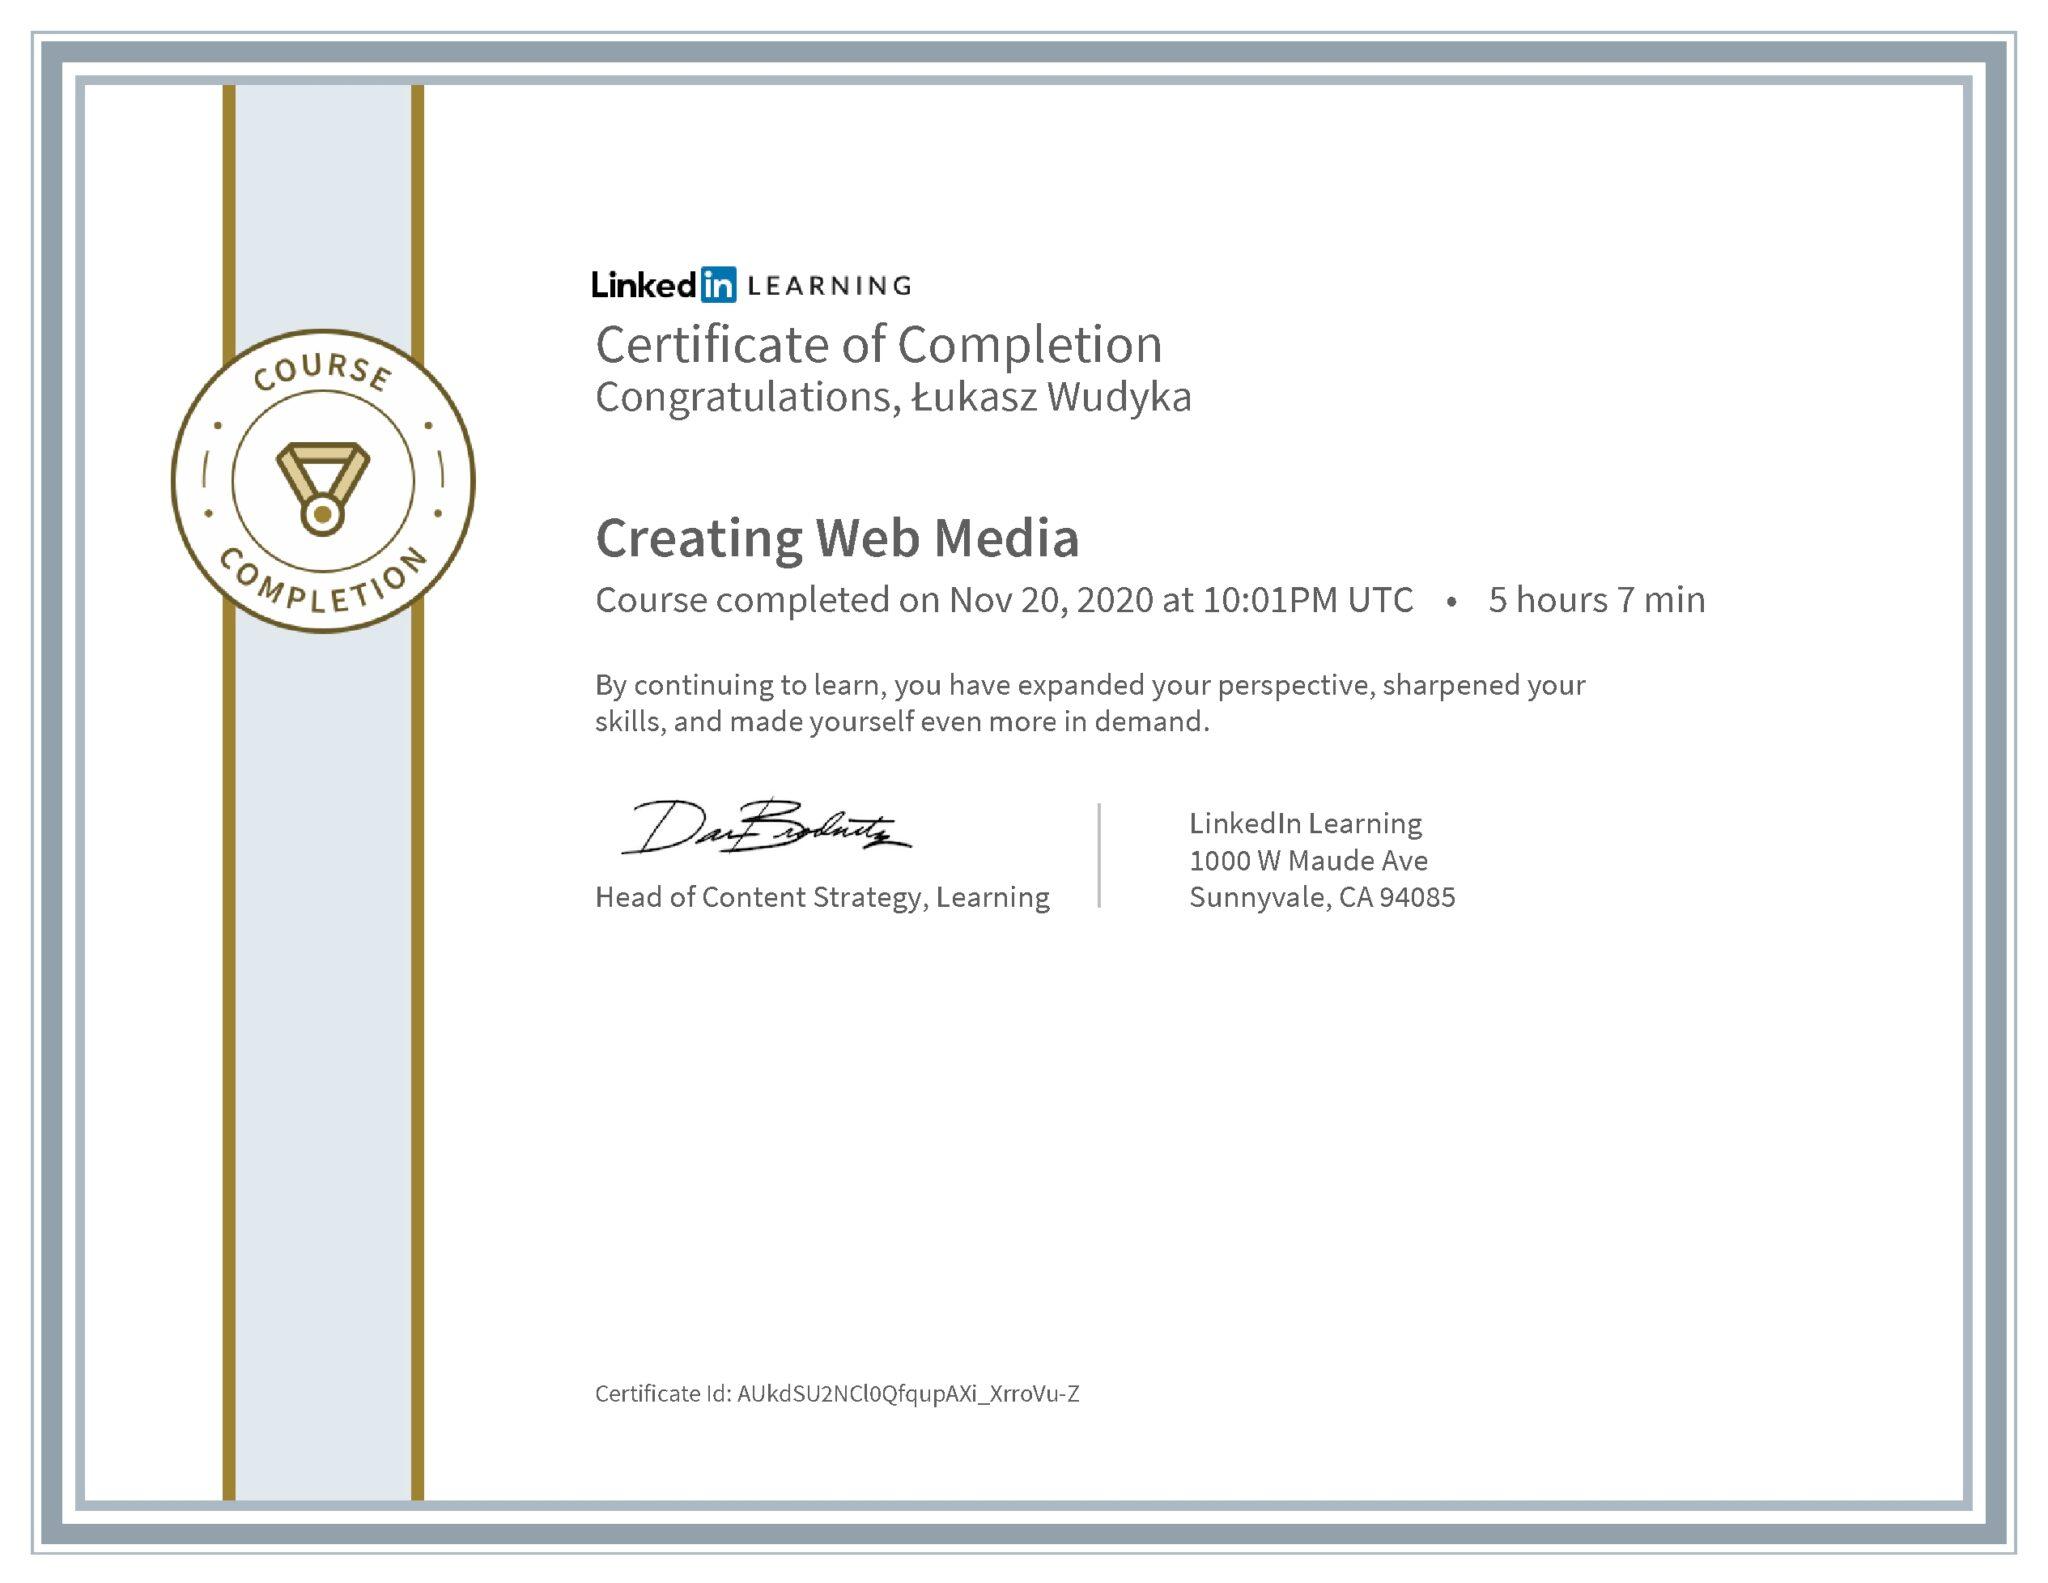 Łukasz Wudyka certyfikat LinkedIn Creating Web Media